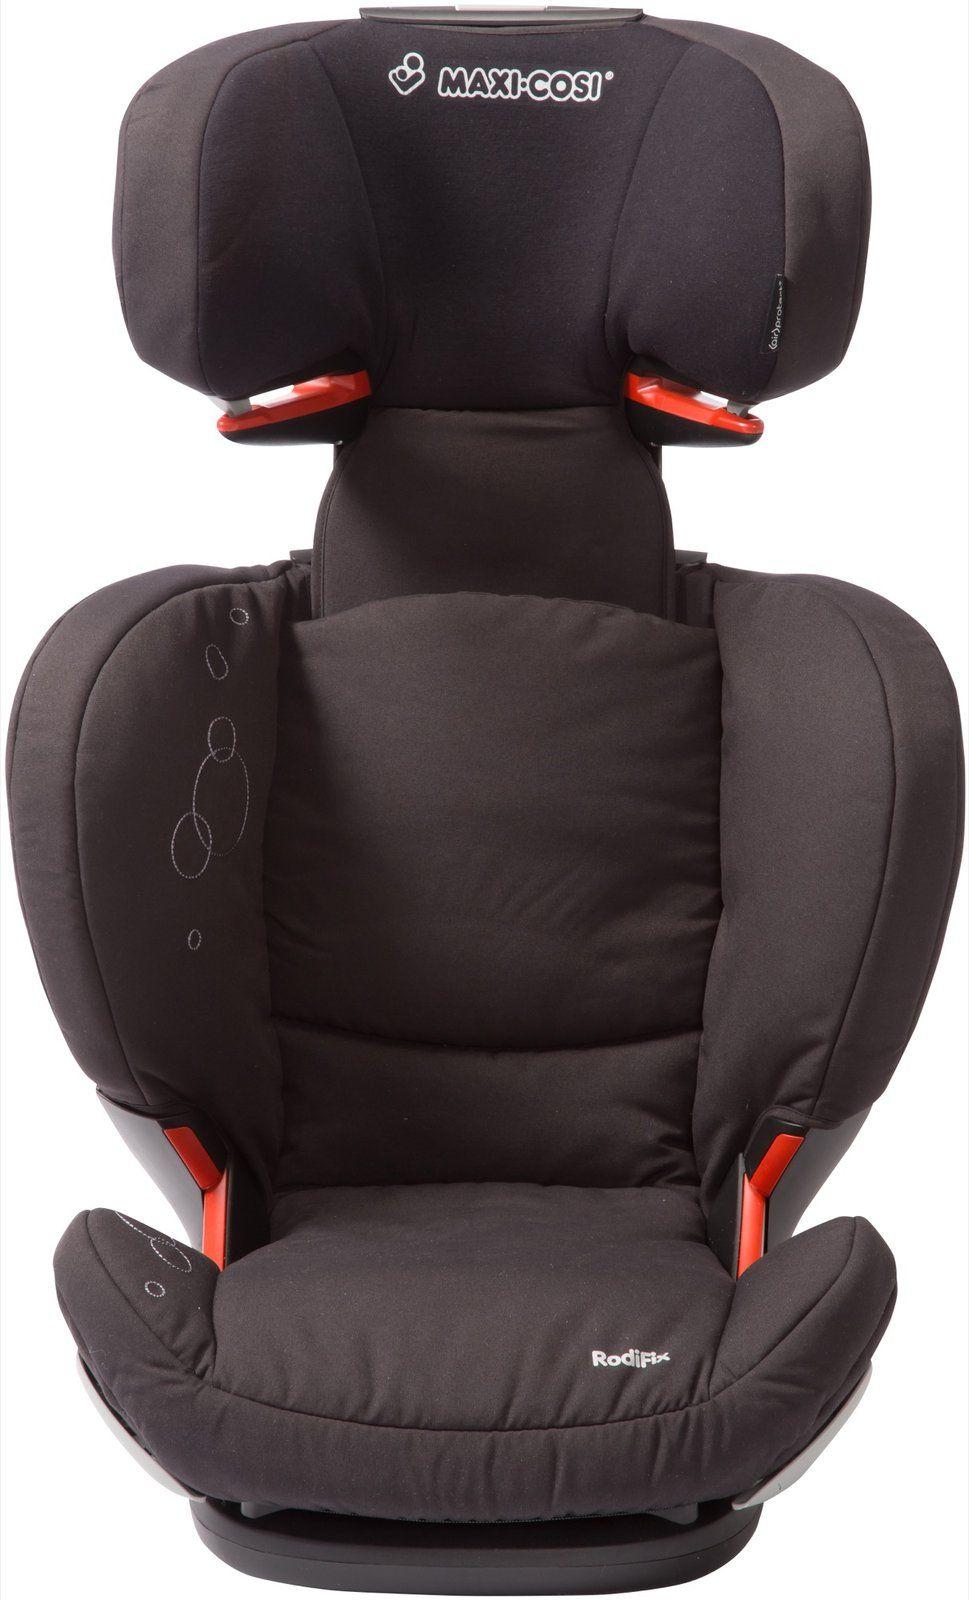 maxi cosi rodifix booster car seat total black free. Black Bedroom Furniture Sets. Home Design Ideas